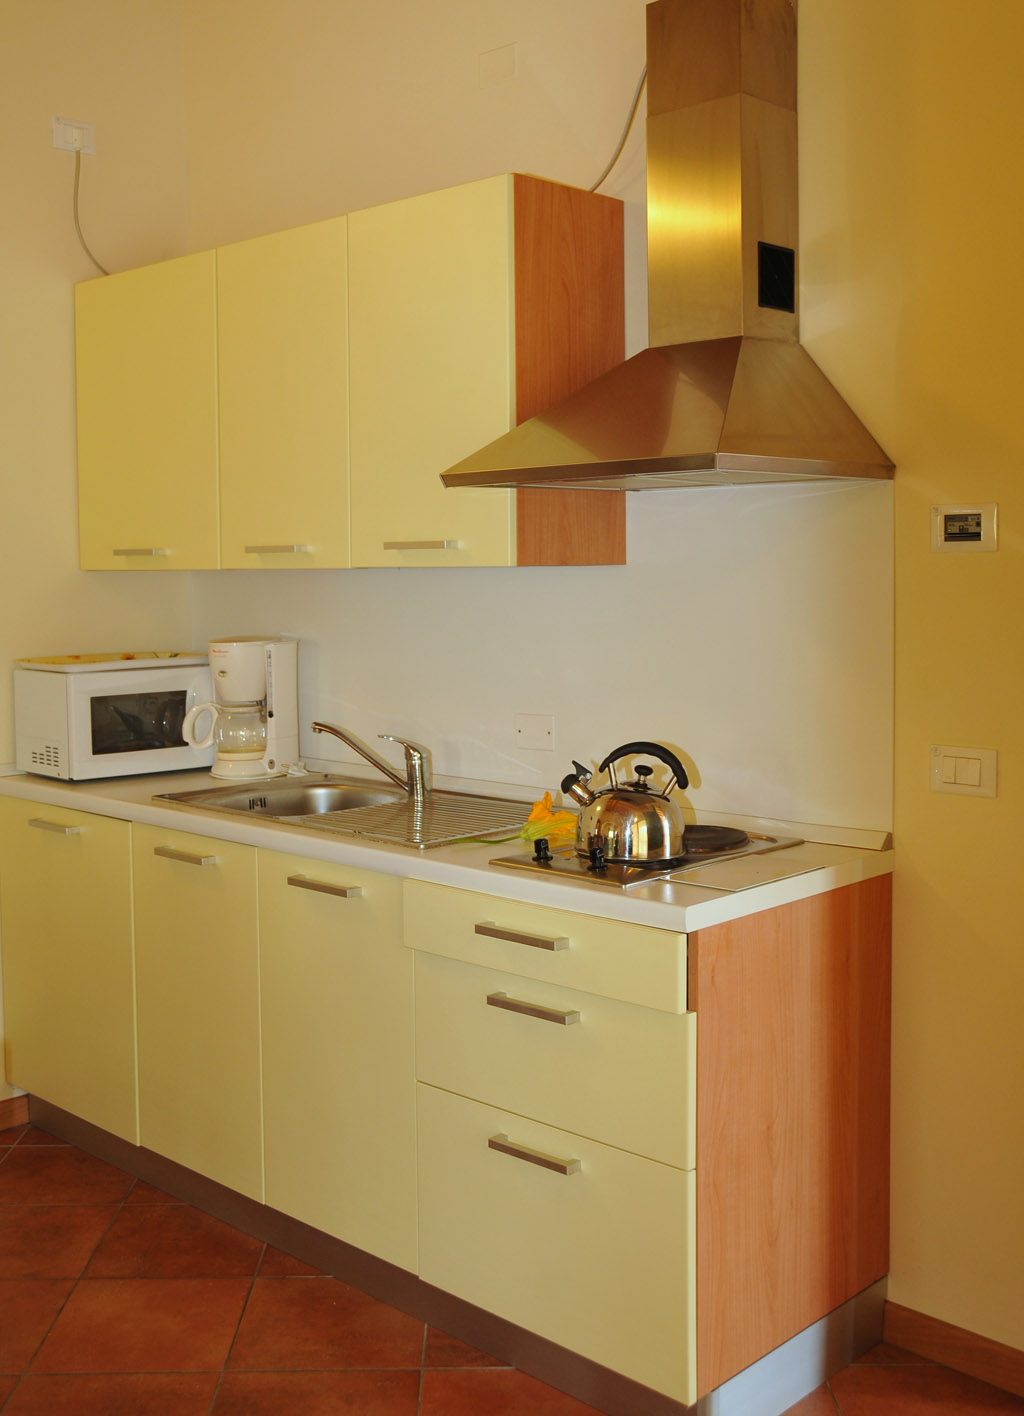 Cucinino - Residence Vico - Lago d'Idro